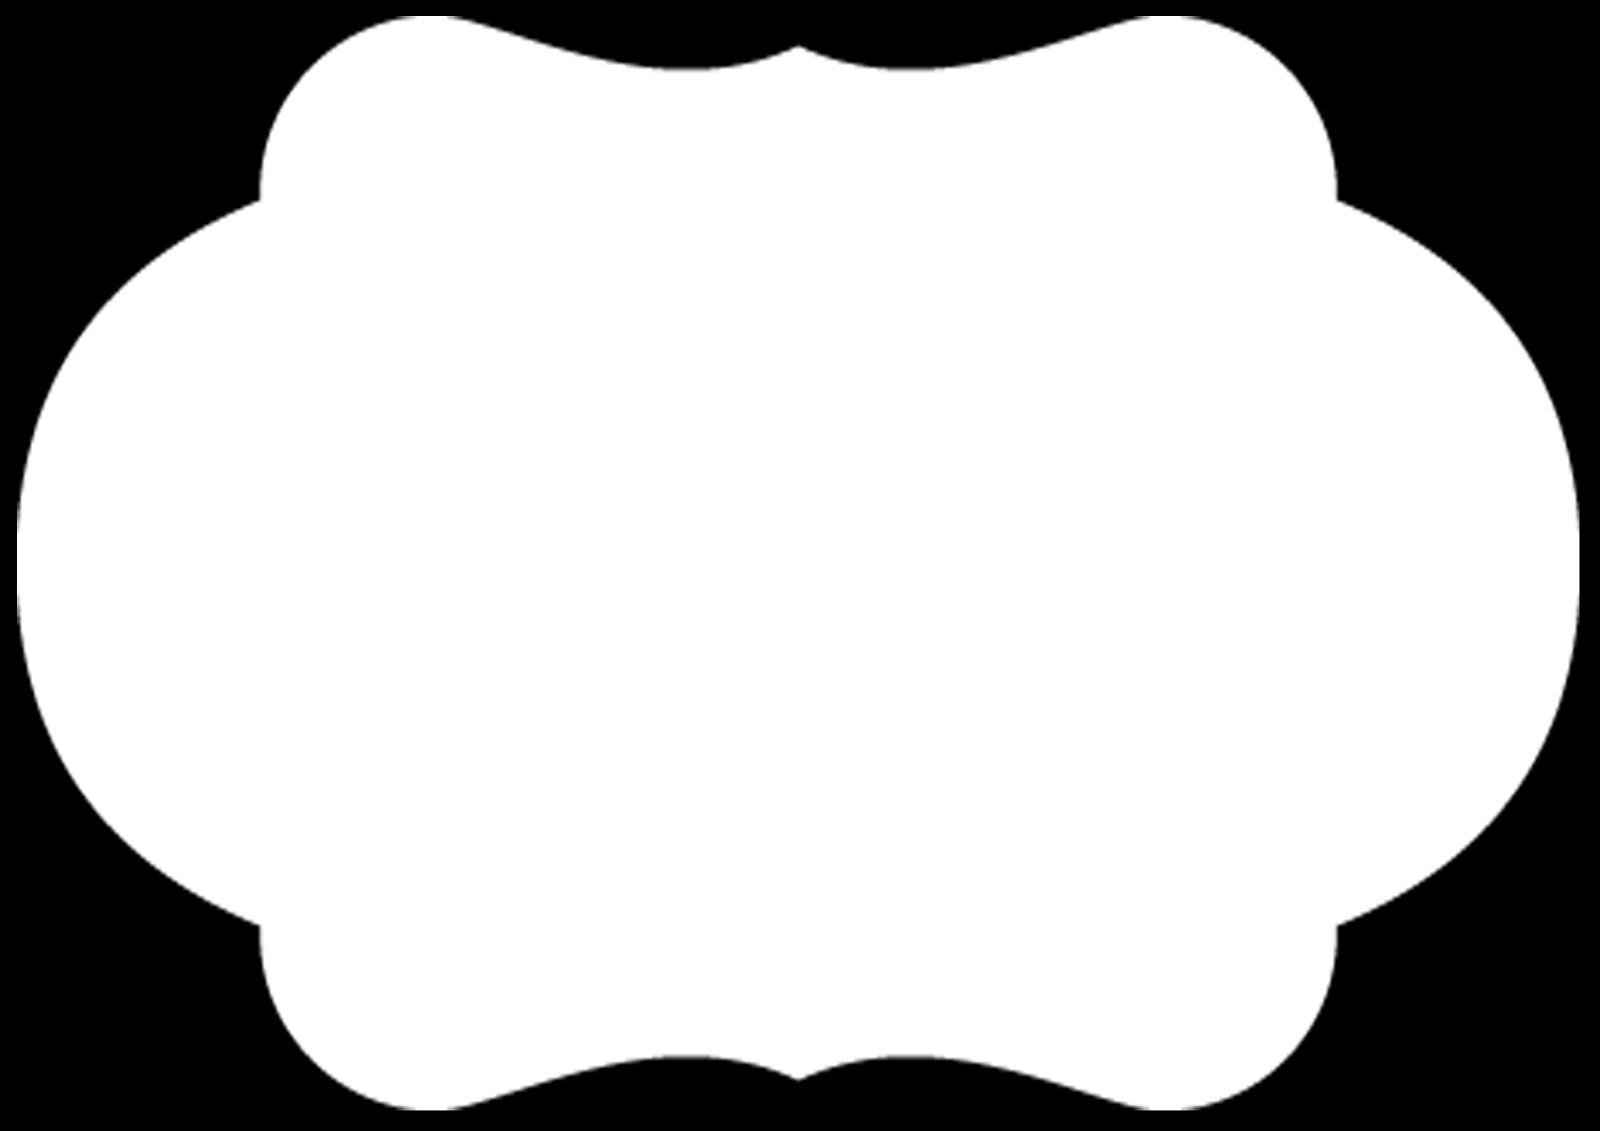 banner royalty free stock Tag clipart black and white. Etiquetas en blanco y